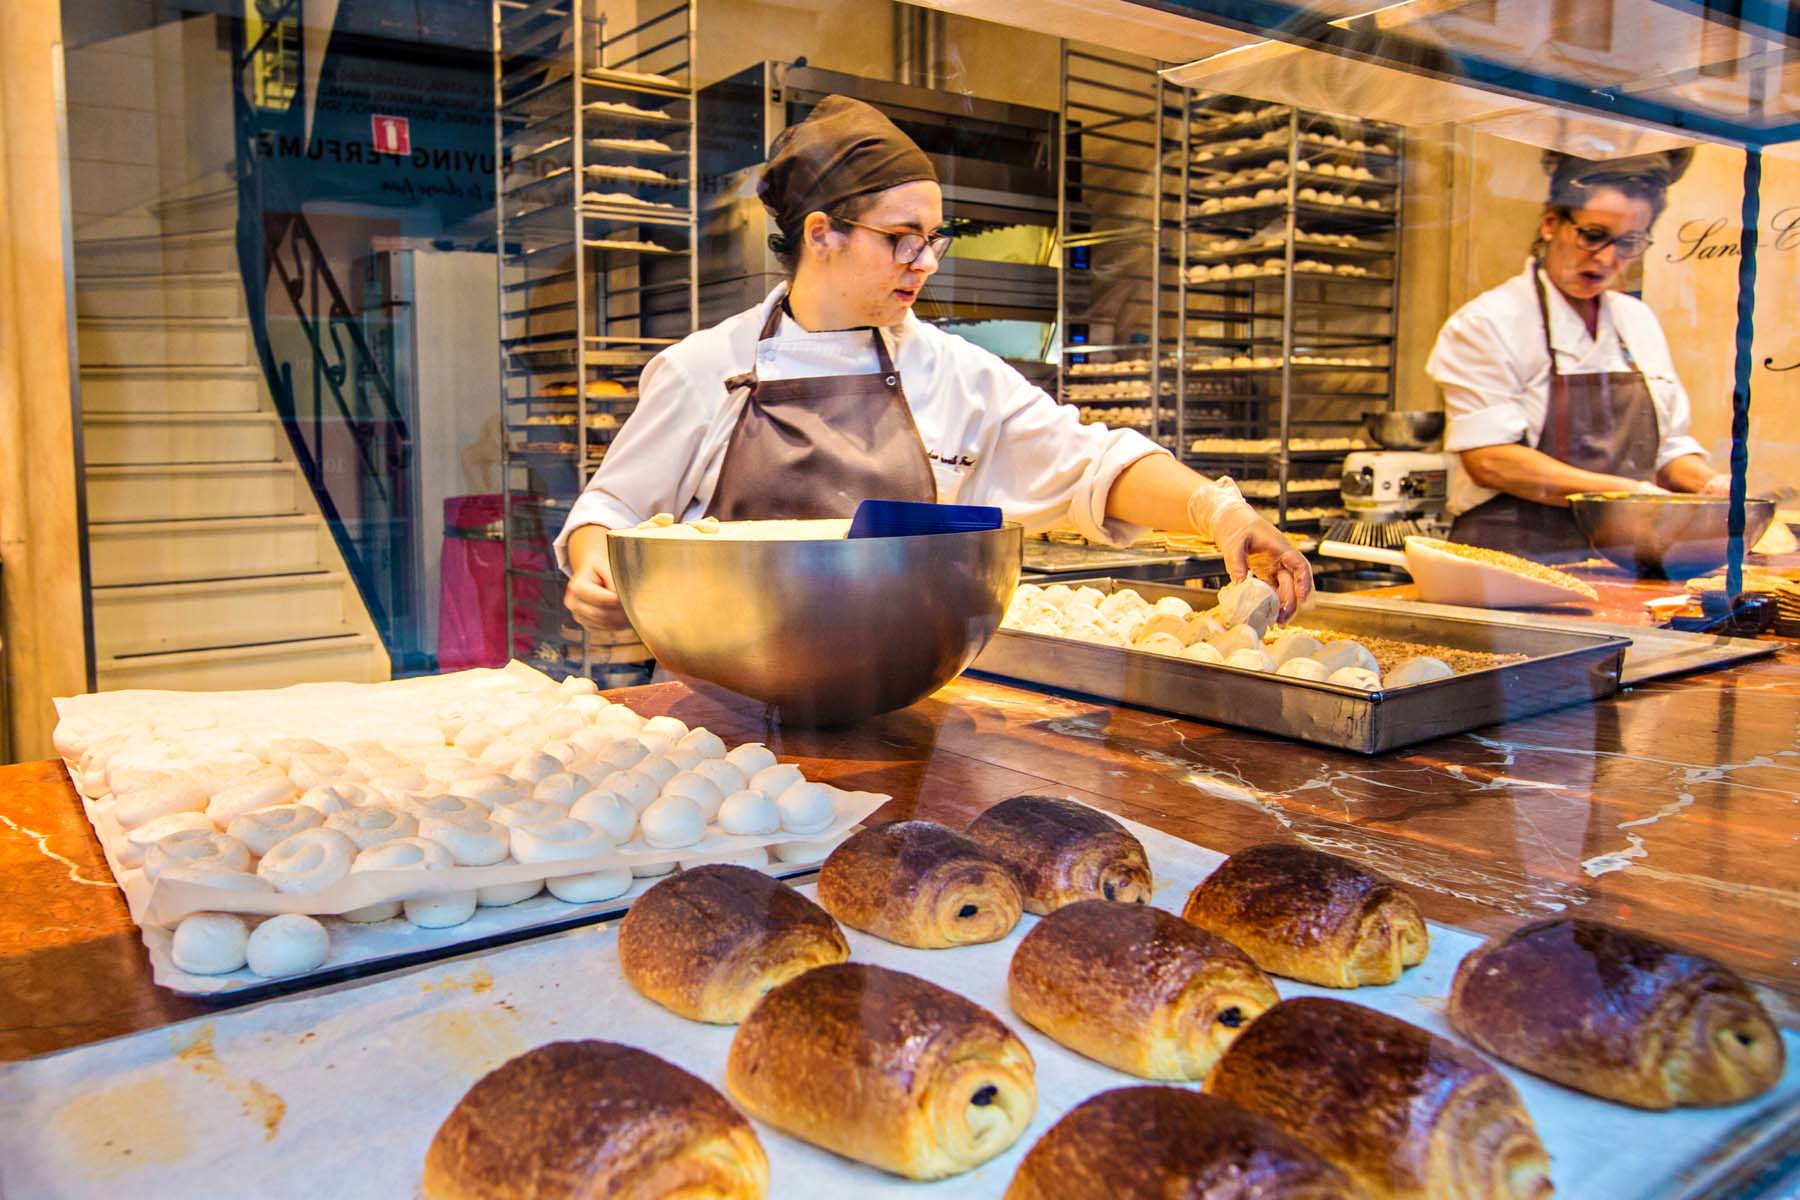 work in a bakery